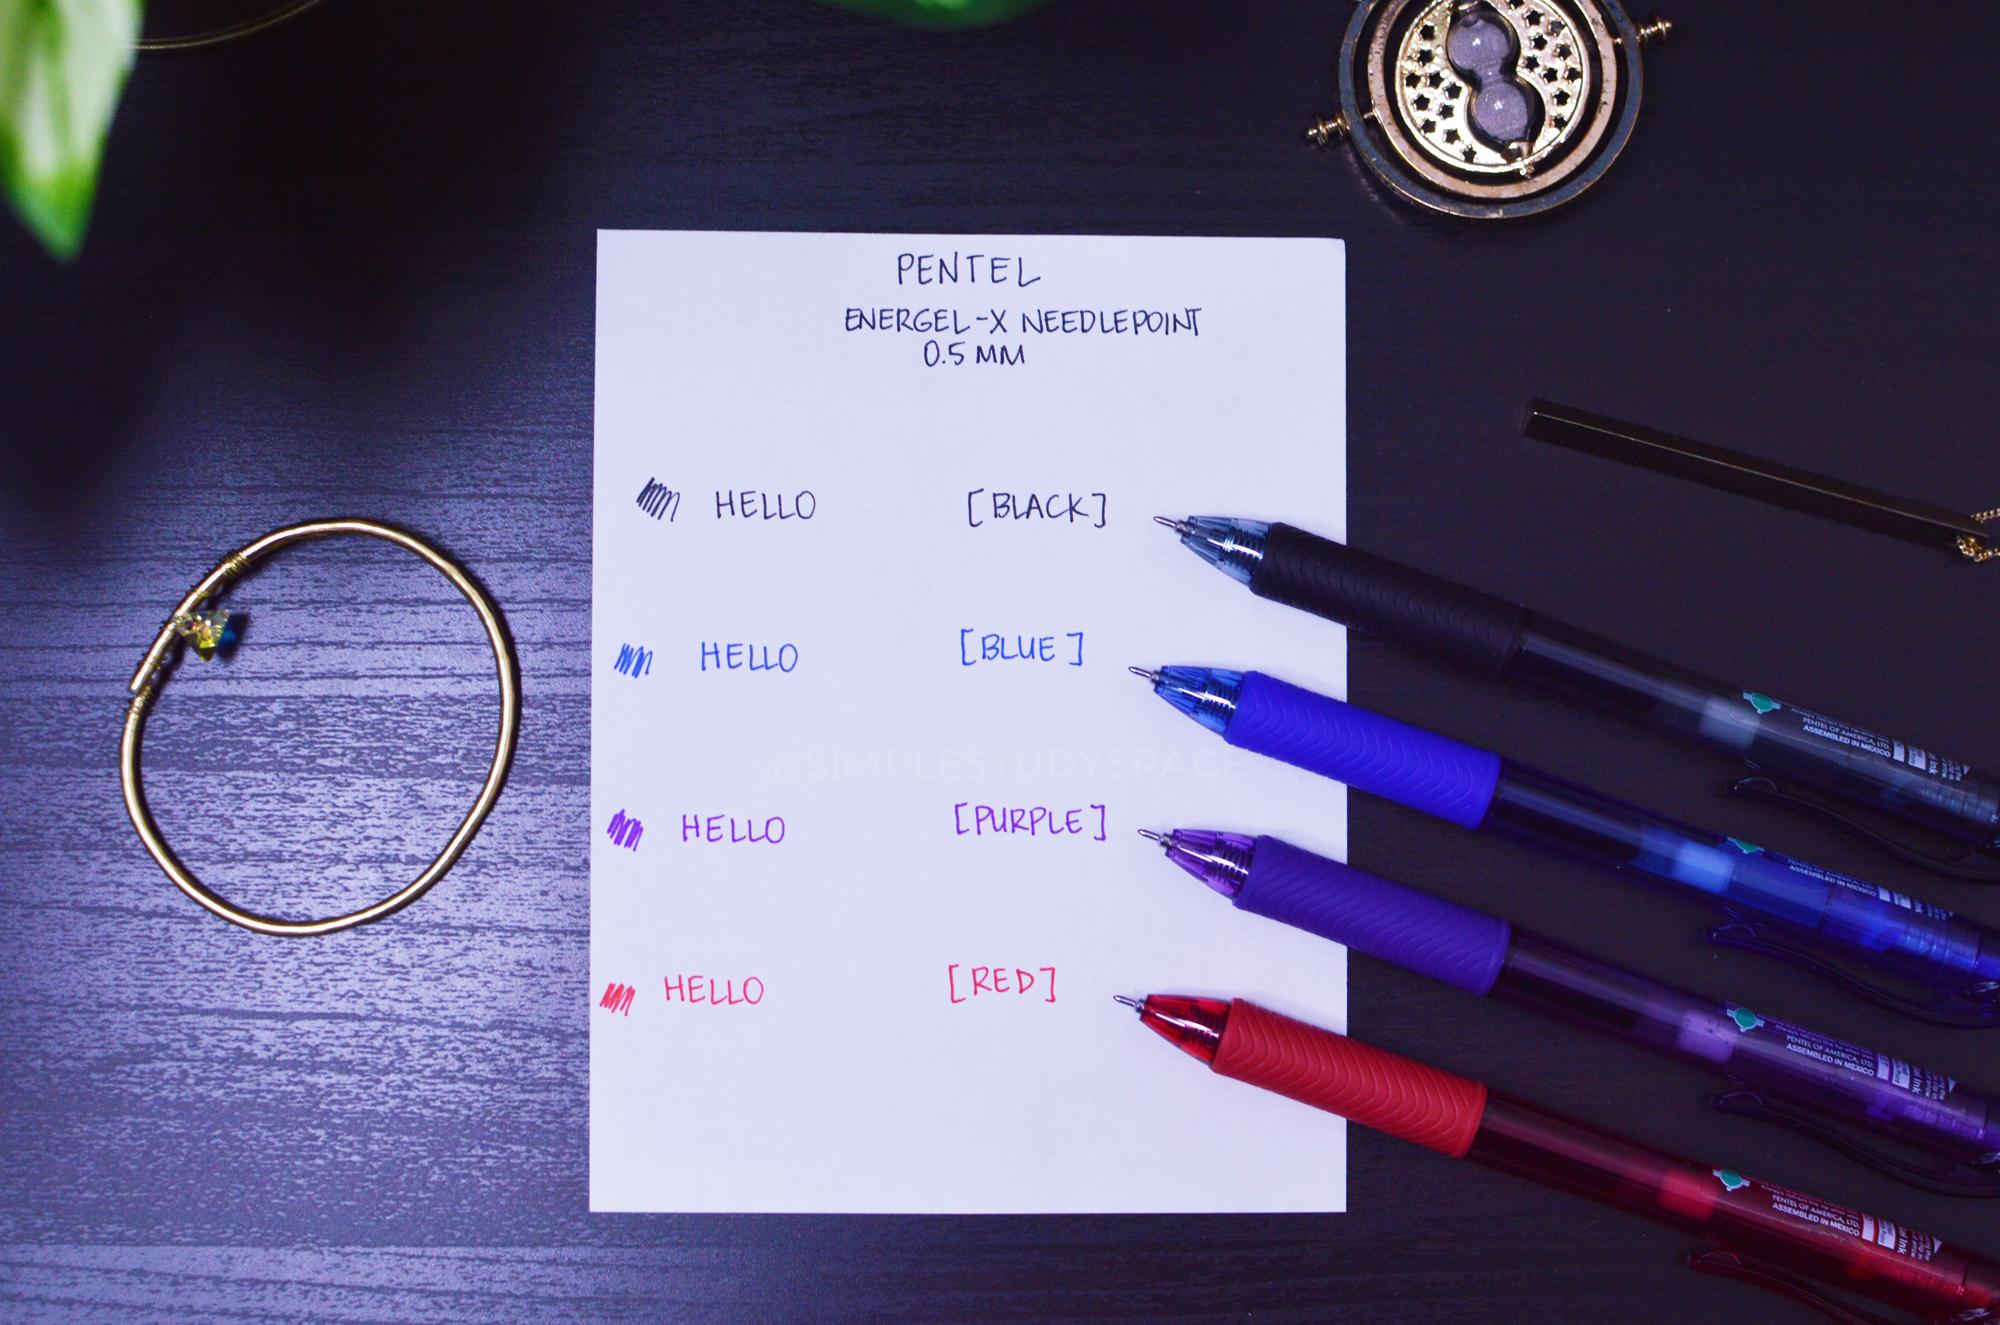 Pen Review: Pentel EnerGel X 0.5 mm Needle-Point